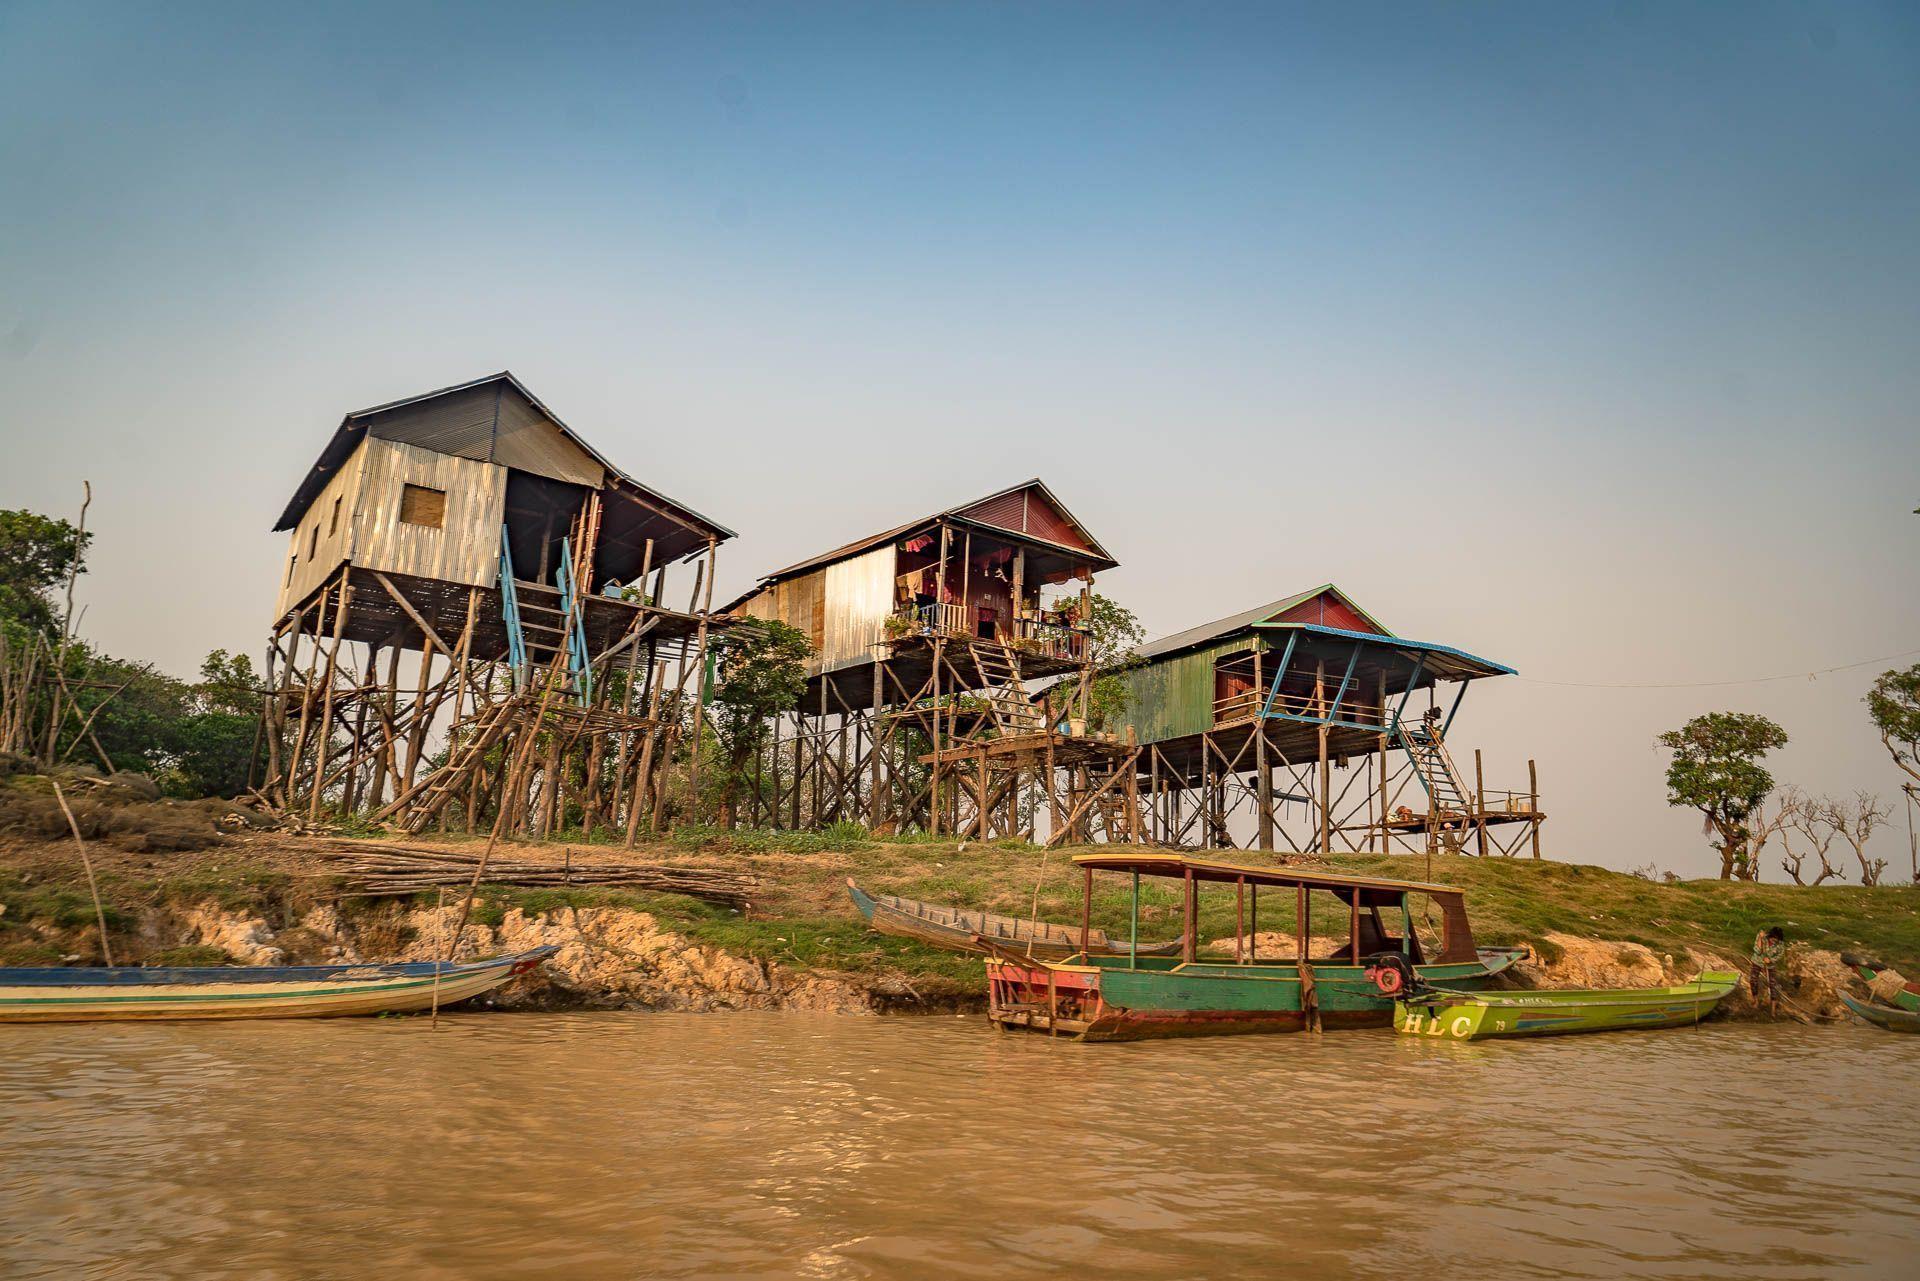 Lesvoyageuses-guide-voyage-siem-reap-angkor-cambodge-lavender-jeep-10